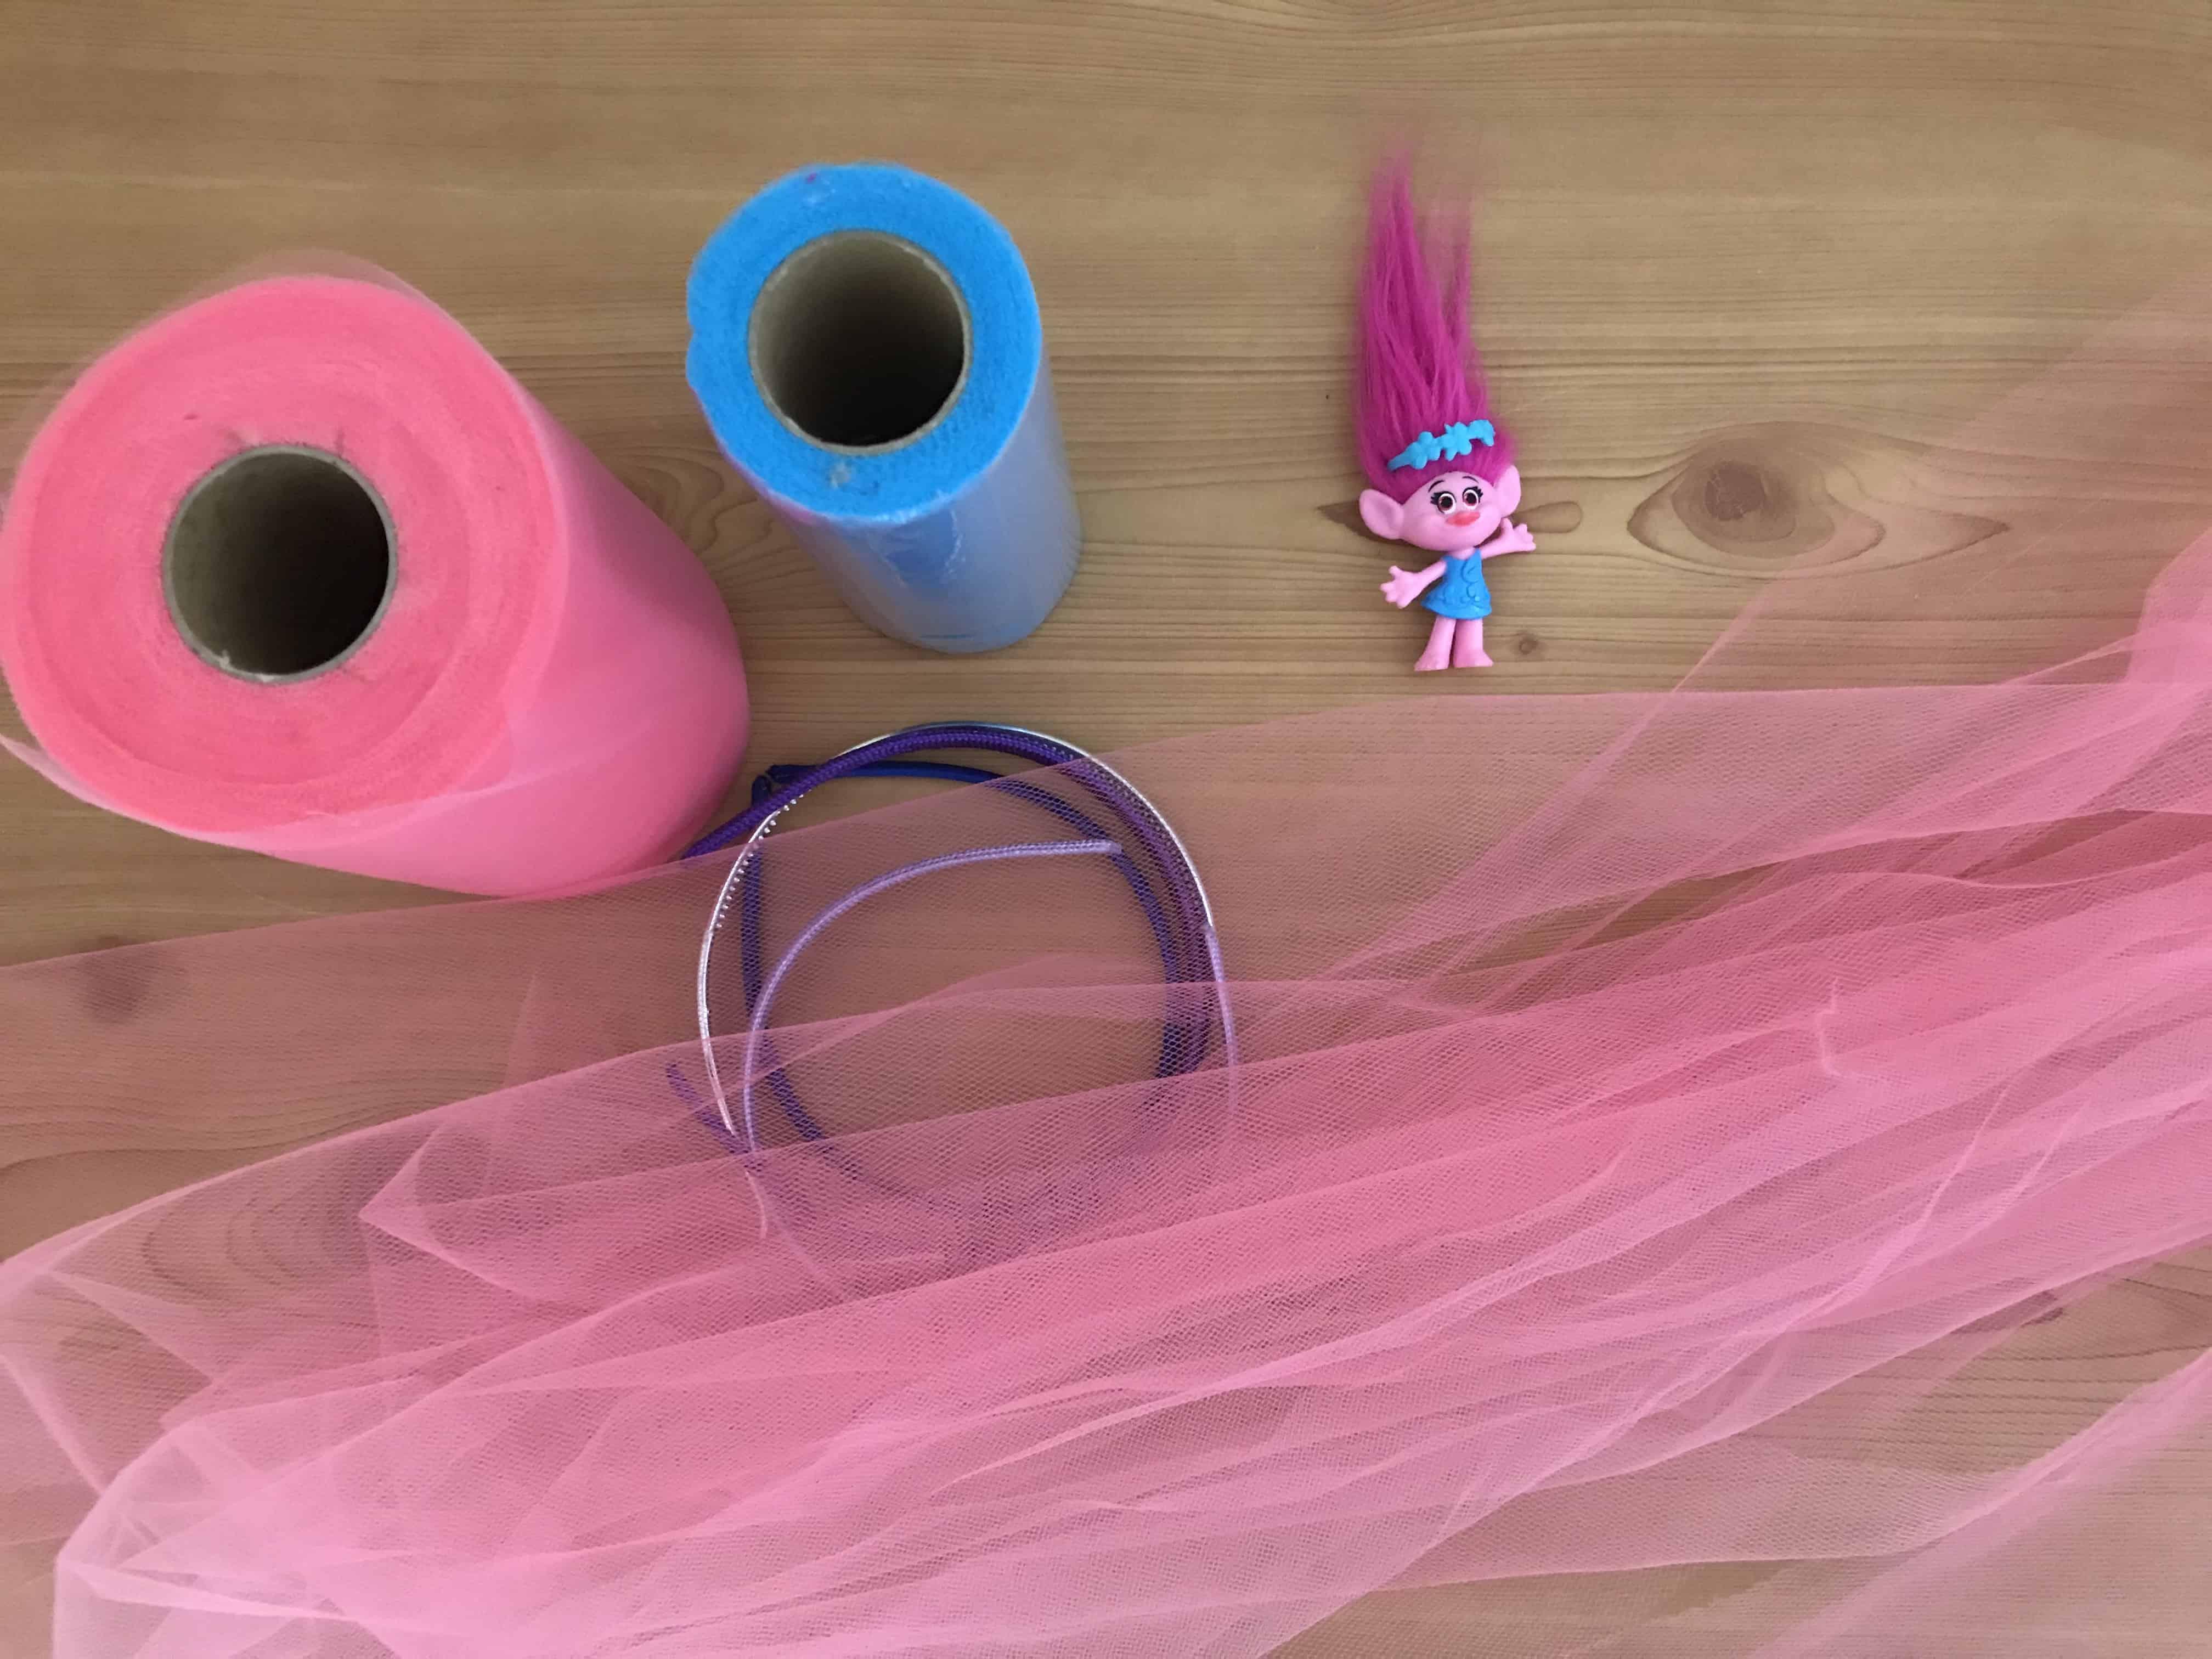 How to make diy trolls hair